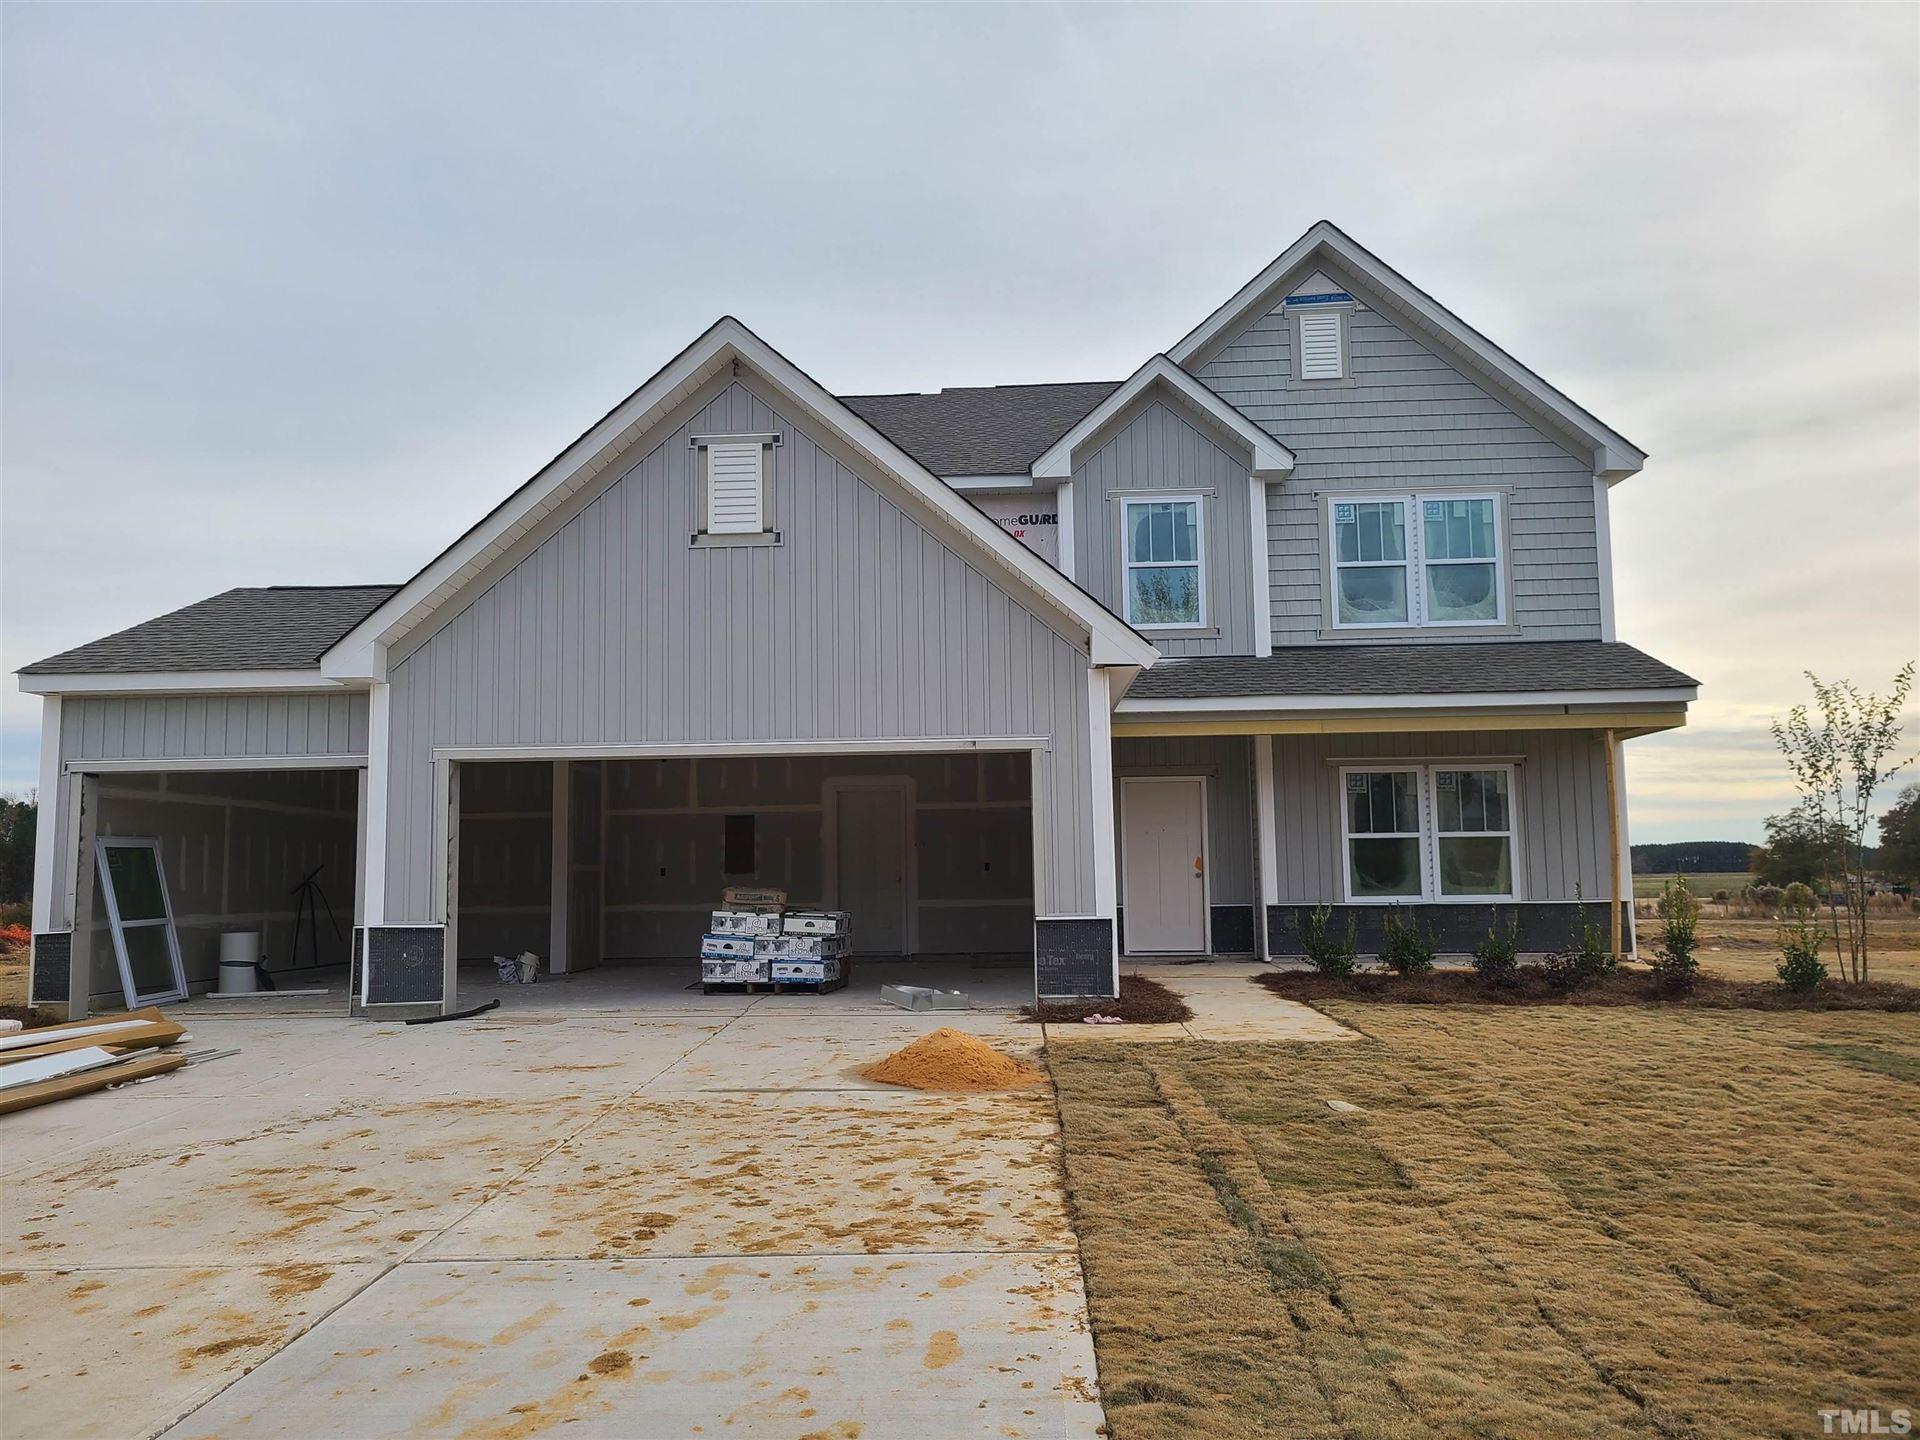 Photo of 106 Walker Grove #14, Lillington, NC 27546 (MLS # 2415805)